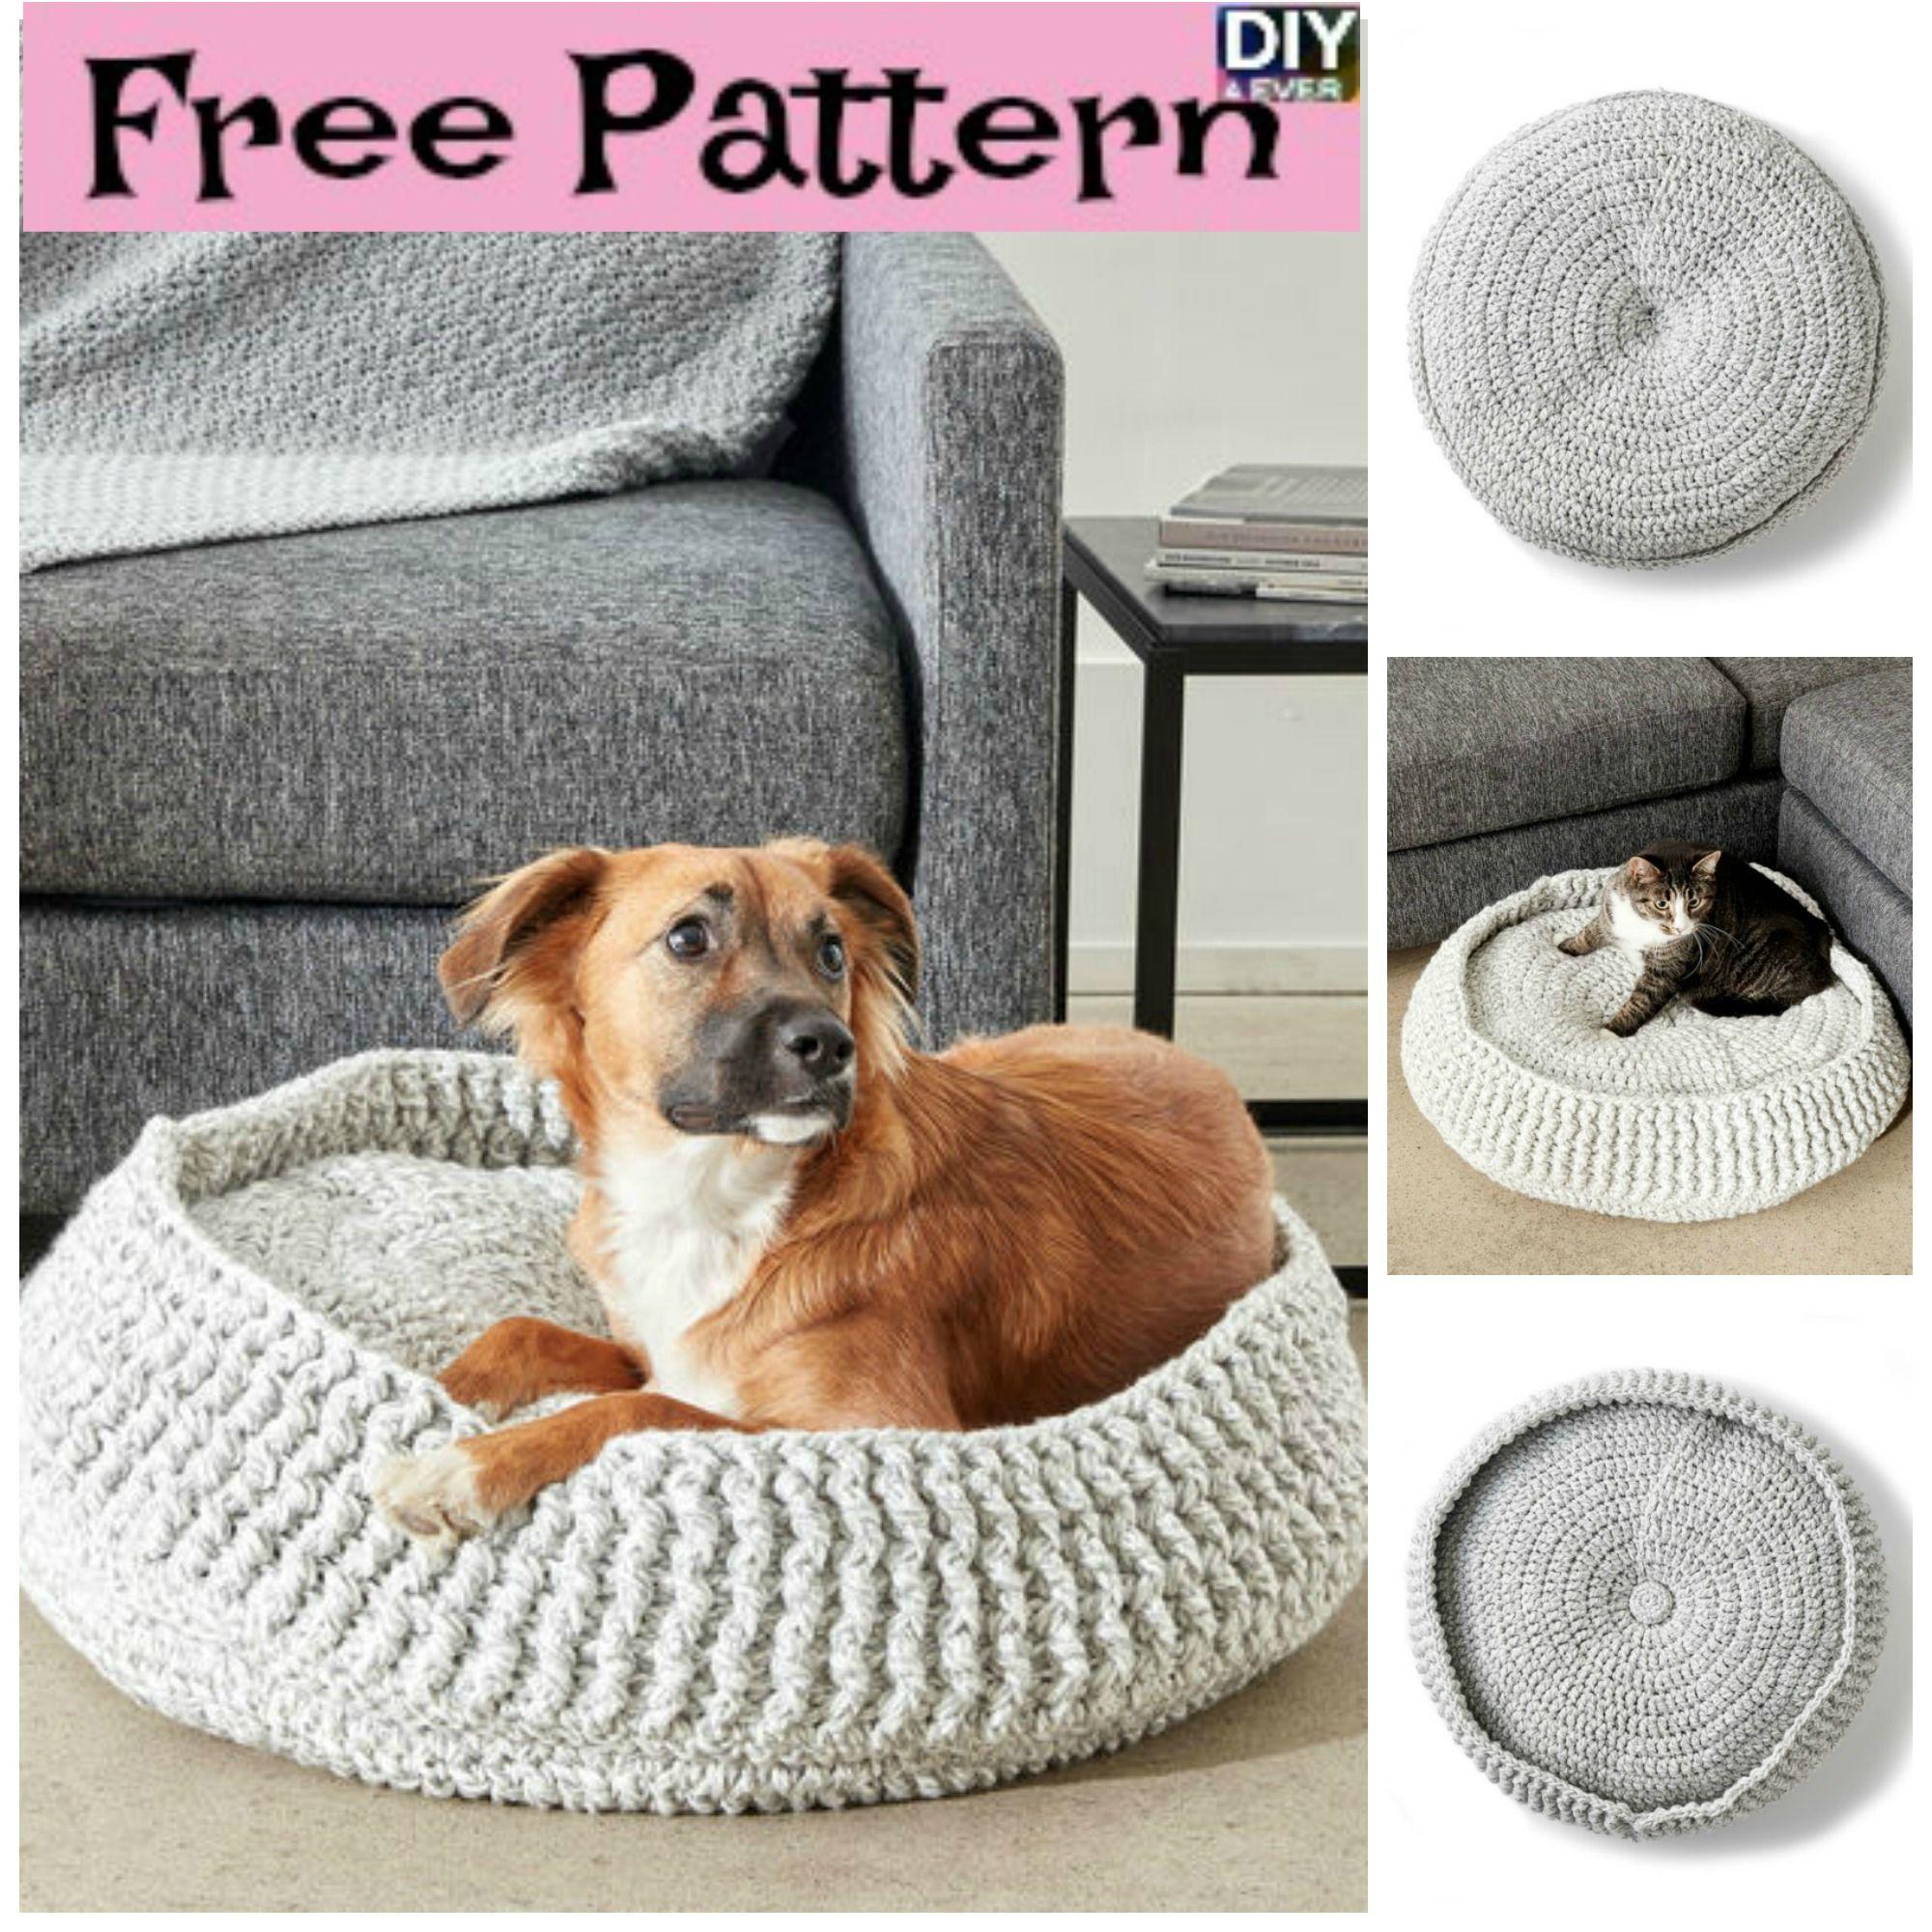 Cozy Crochet Pet Bed - Free Patterns | Crochet pet, Pet beds and ...